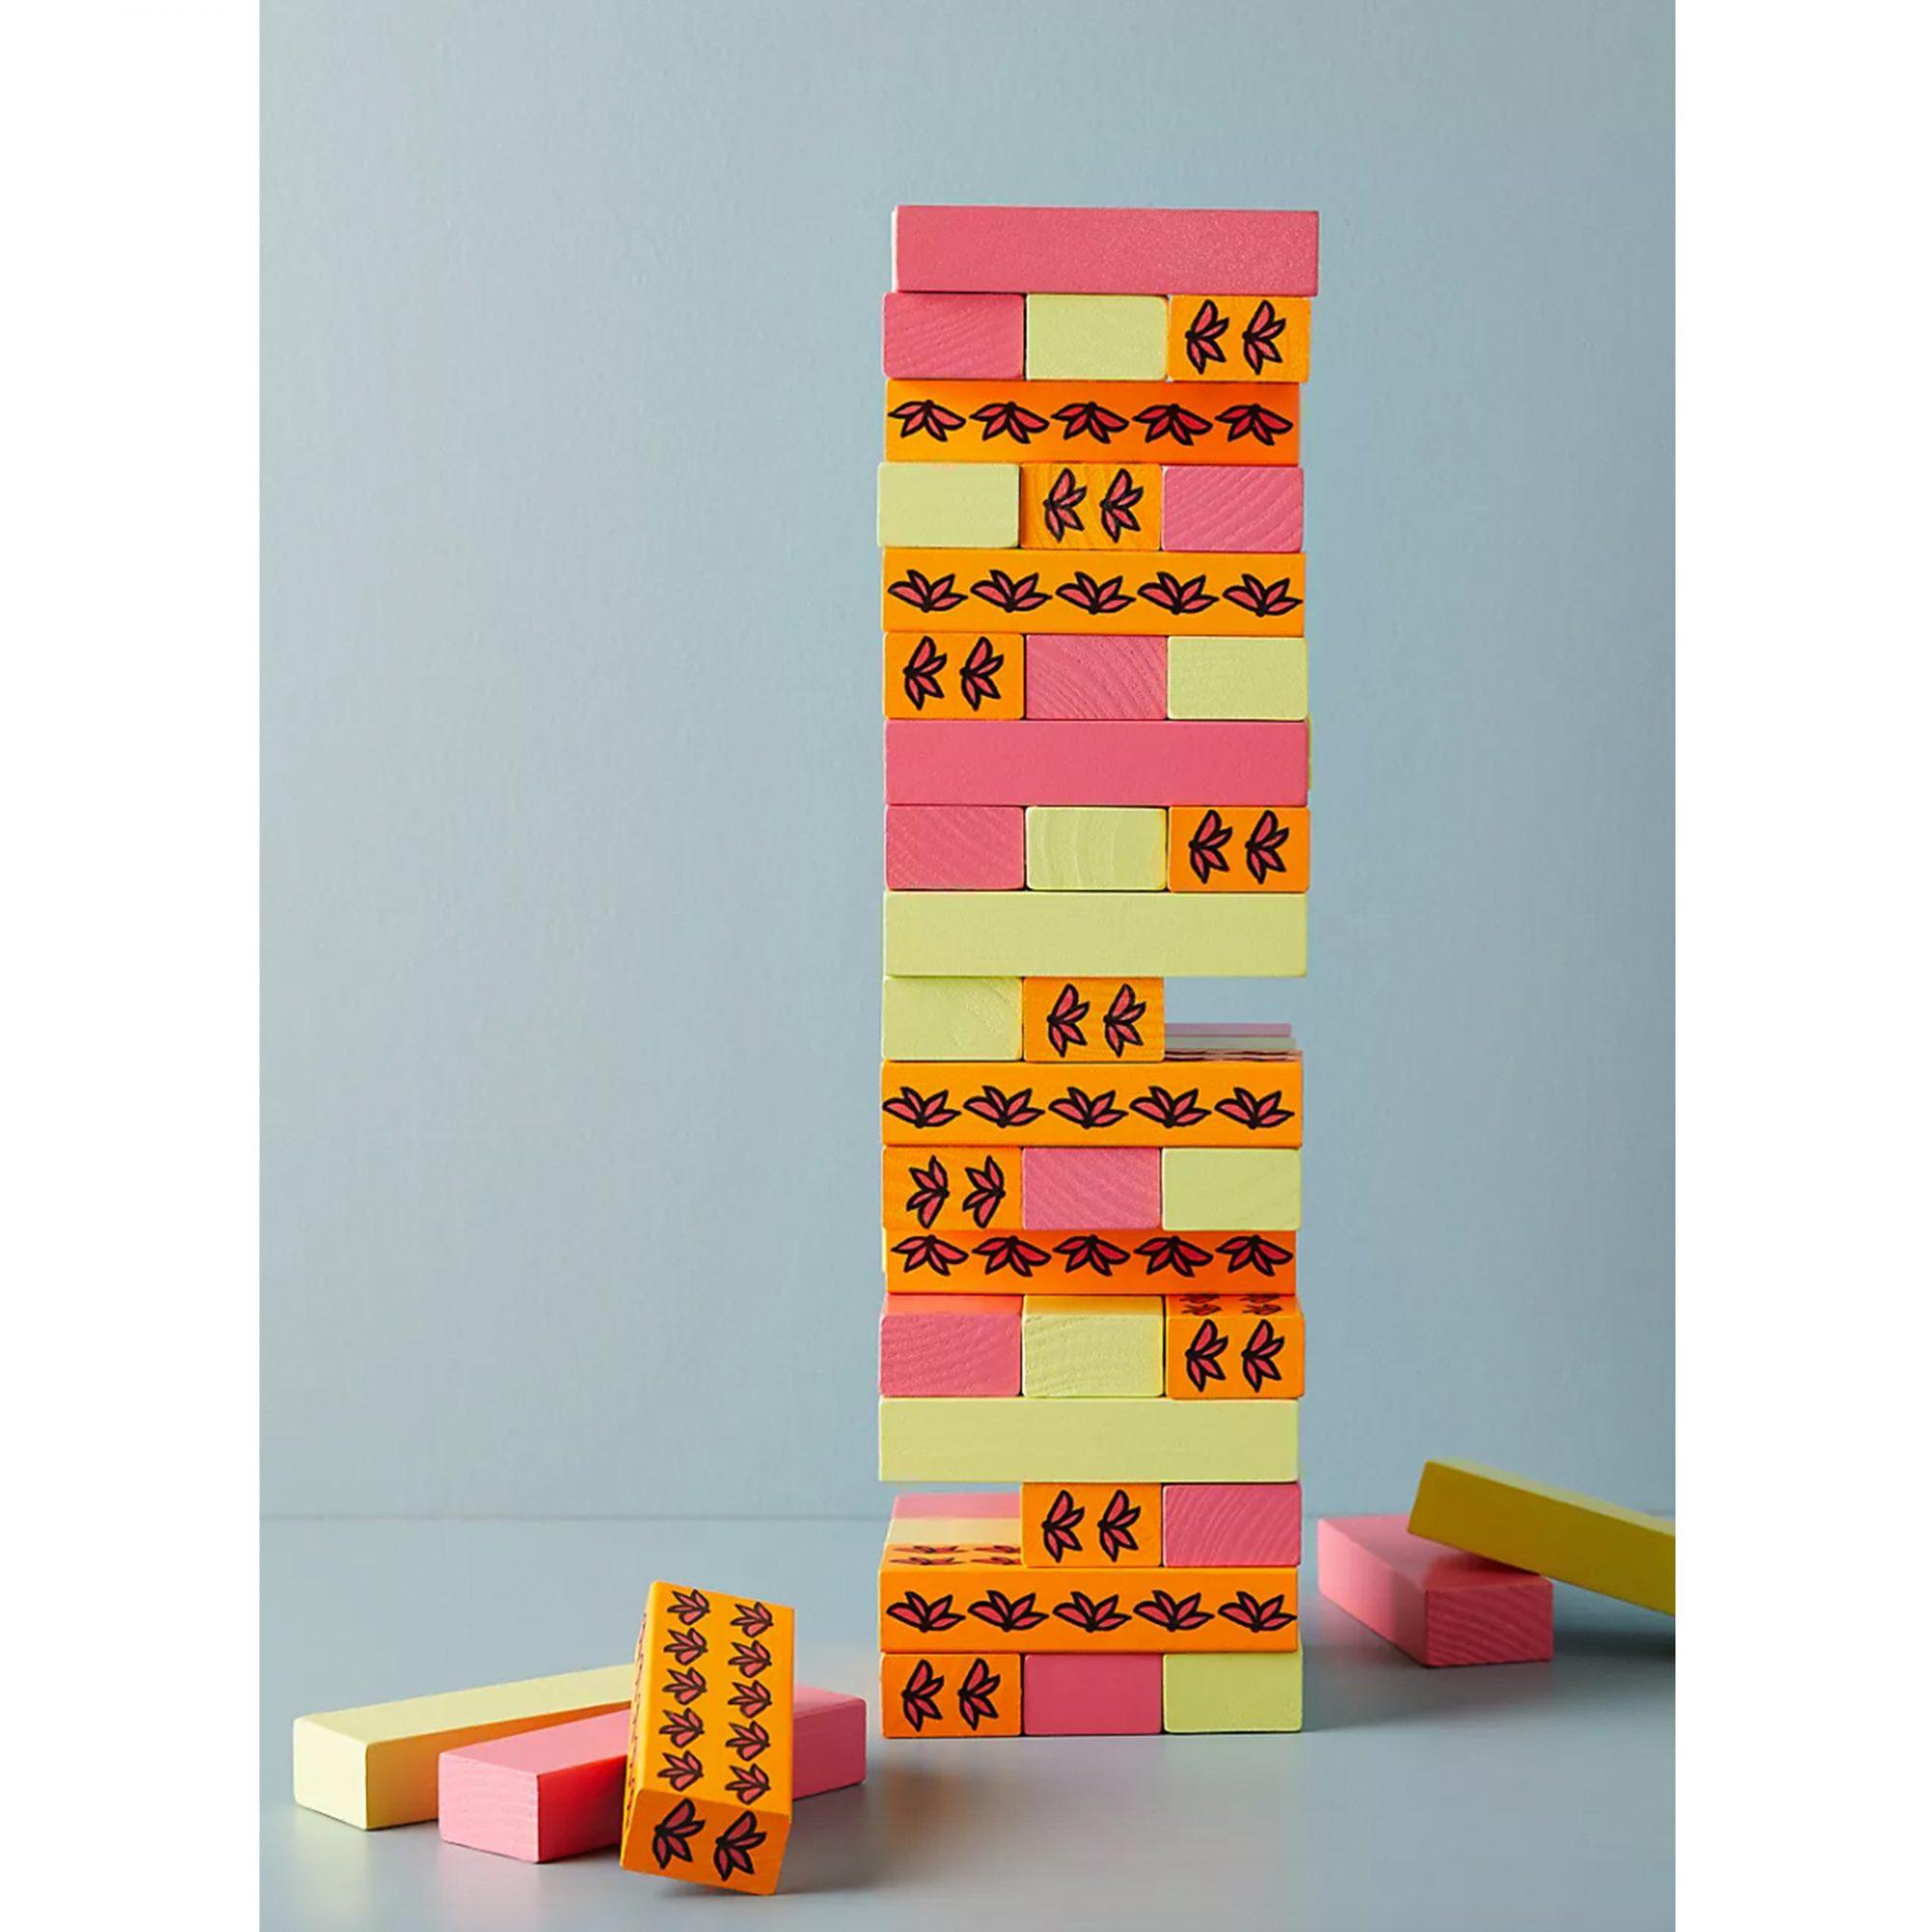 tumbling-tower-blocks, best-friend-gifts